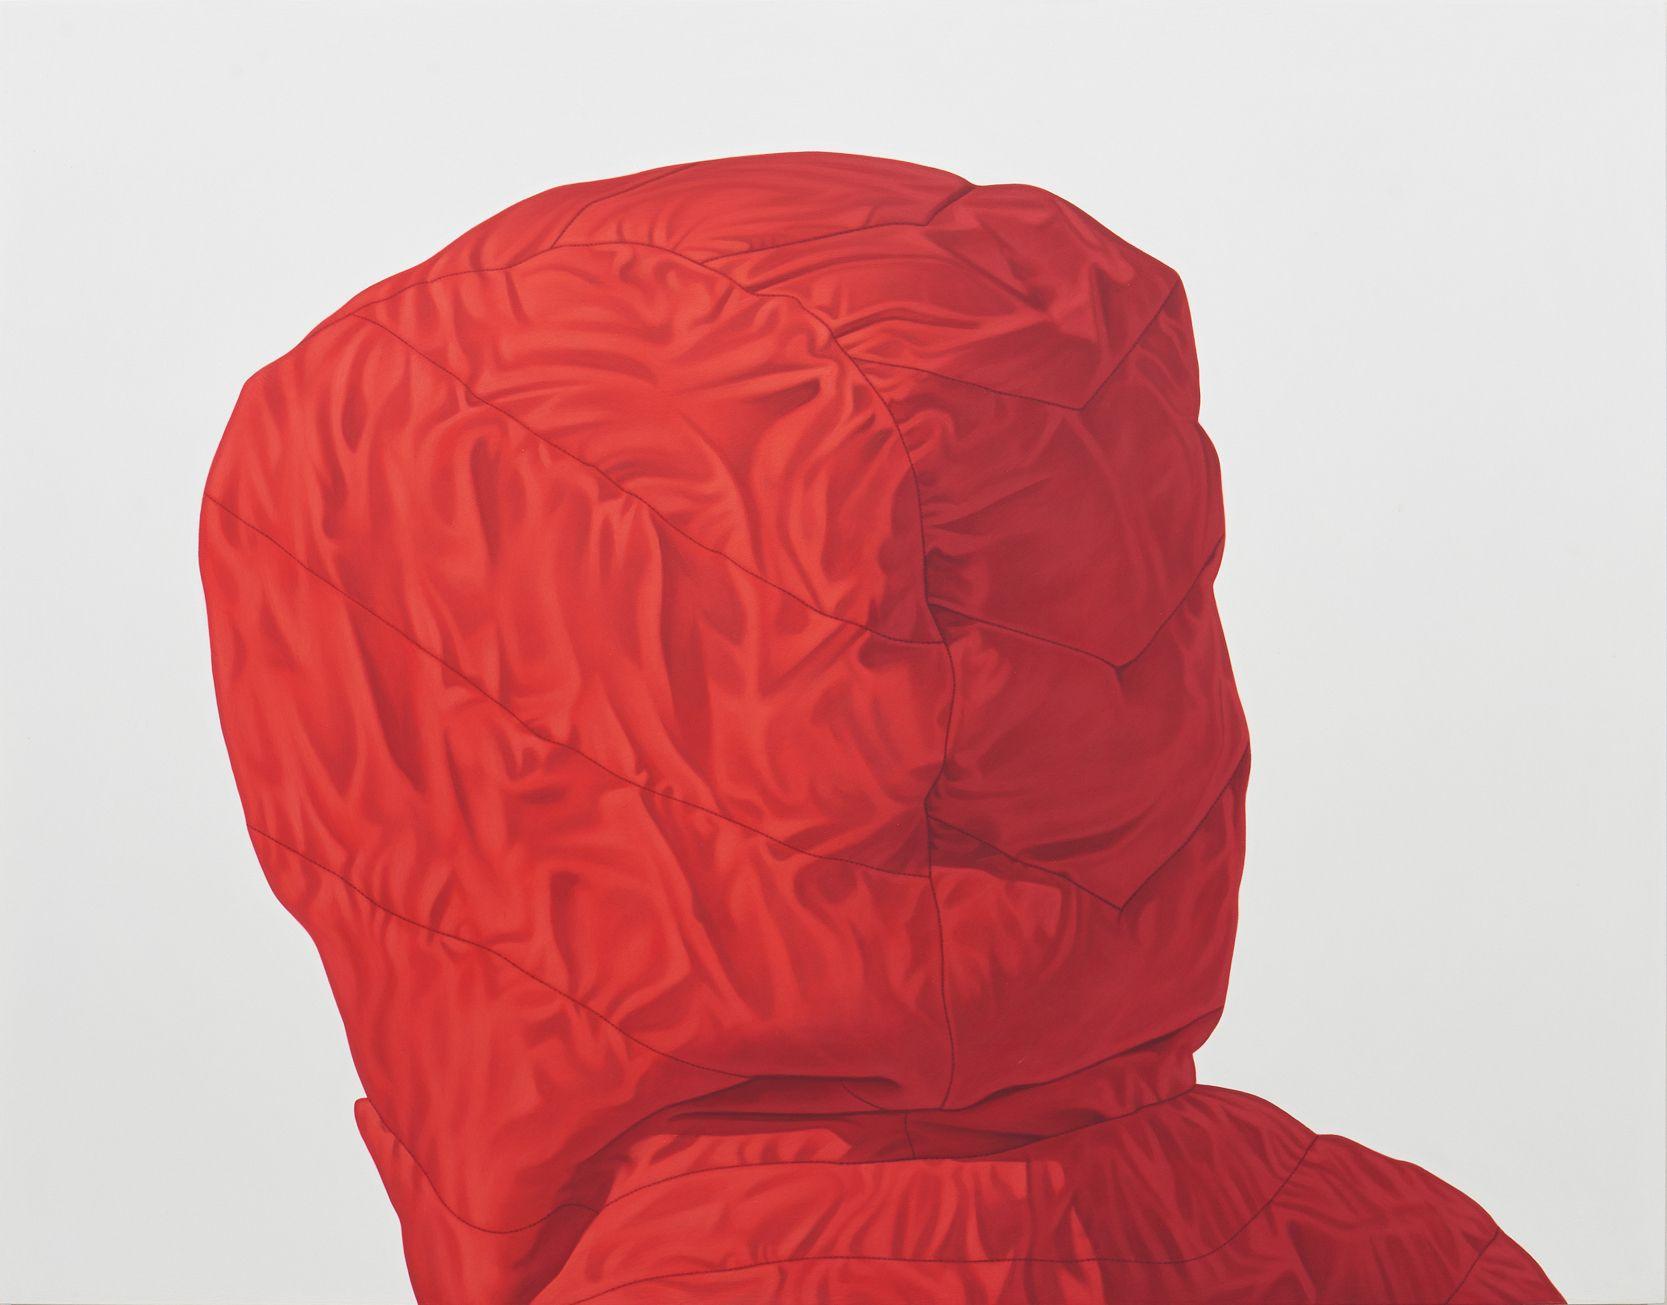 Karel Funk, Untitled #89